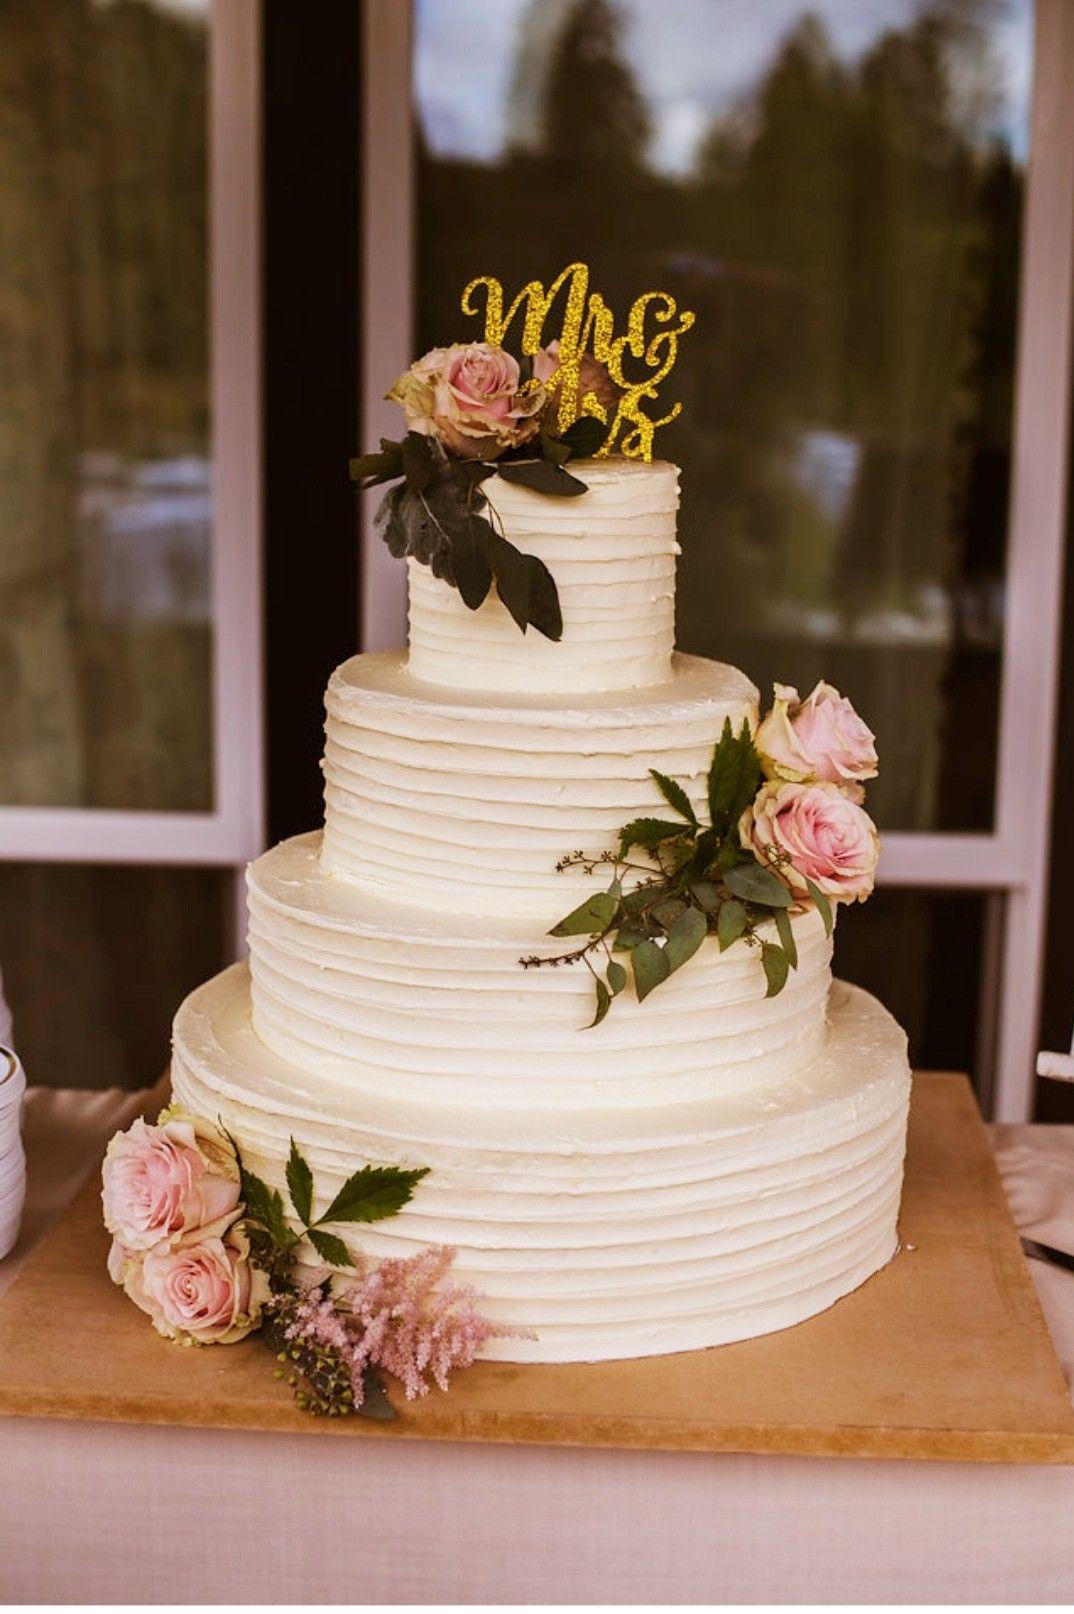 Simple 4 tier wedding cake 4 tier wedding cake, Wedding